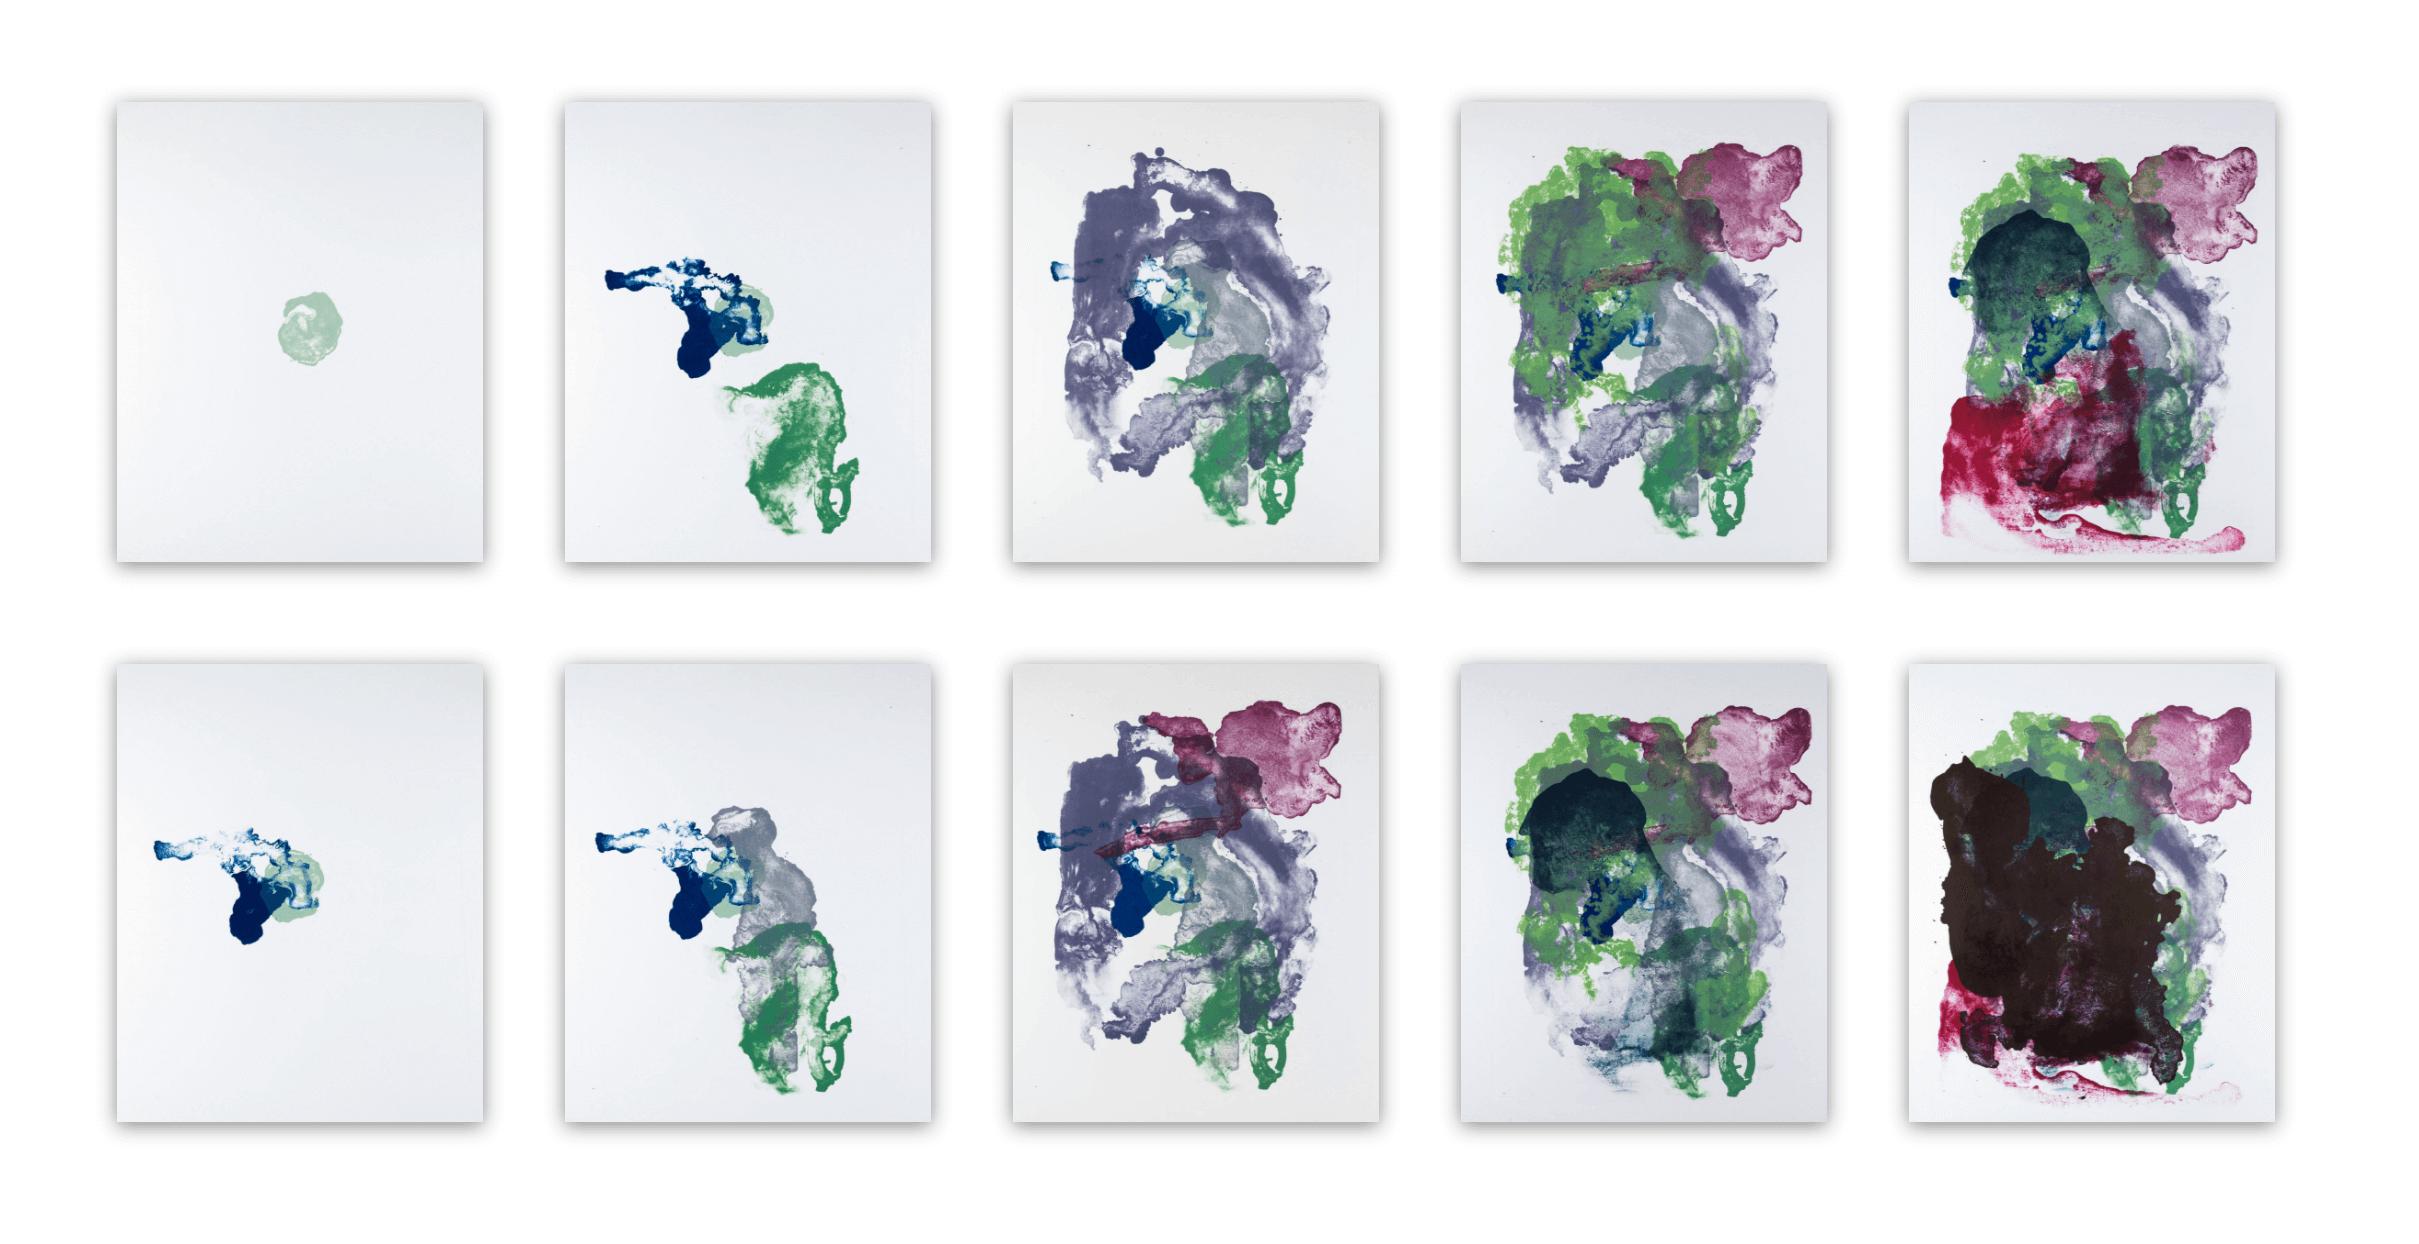 Katharina Albers, organism (growing), 2017, Farblithographie, Unikat 10 Stk. je 56×45 cm